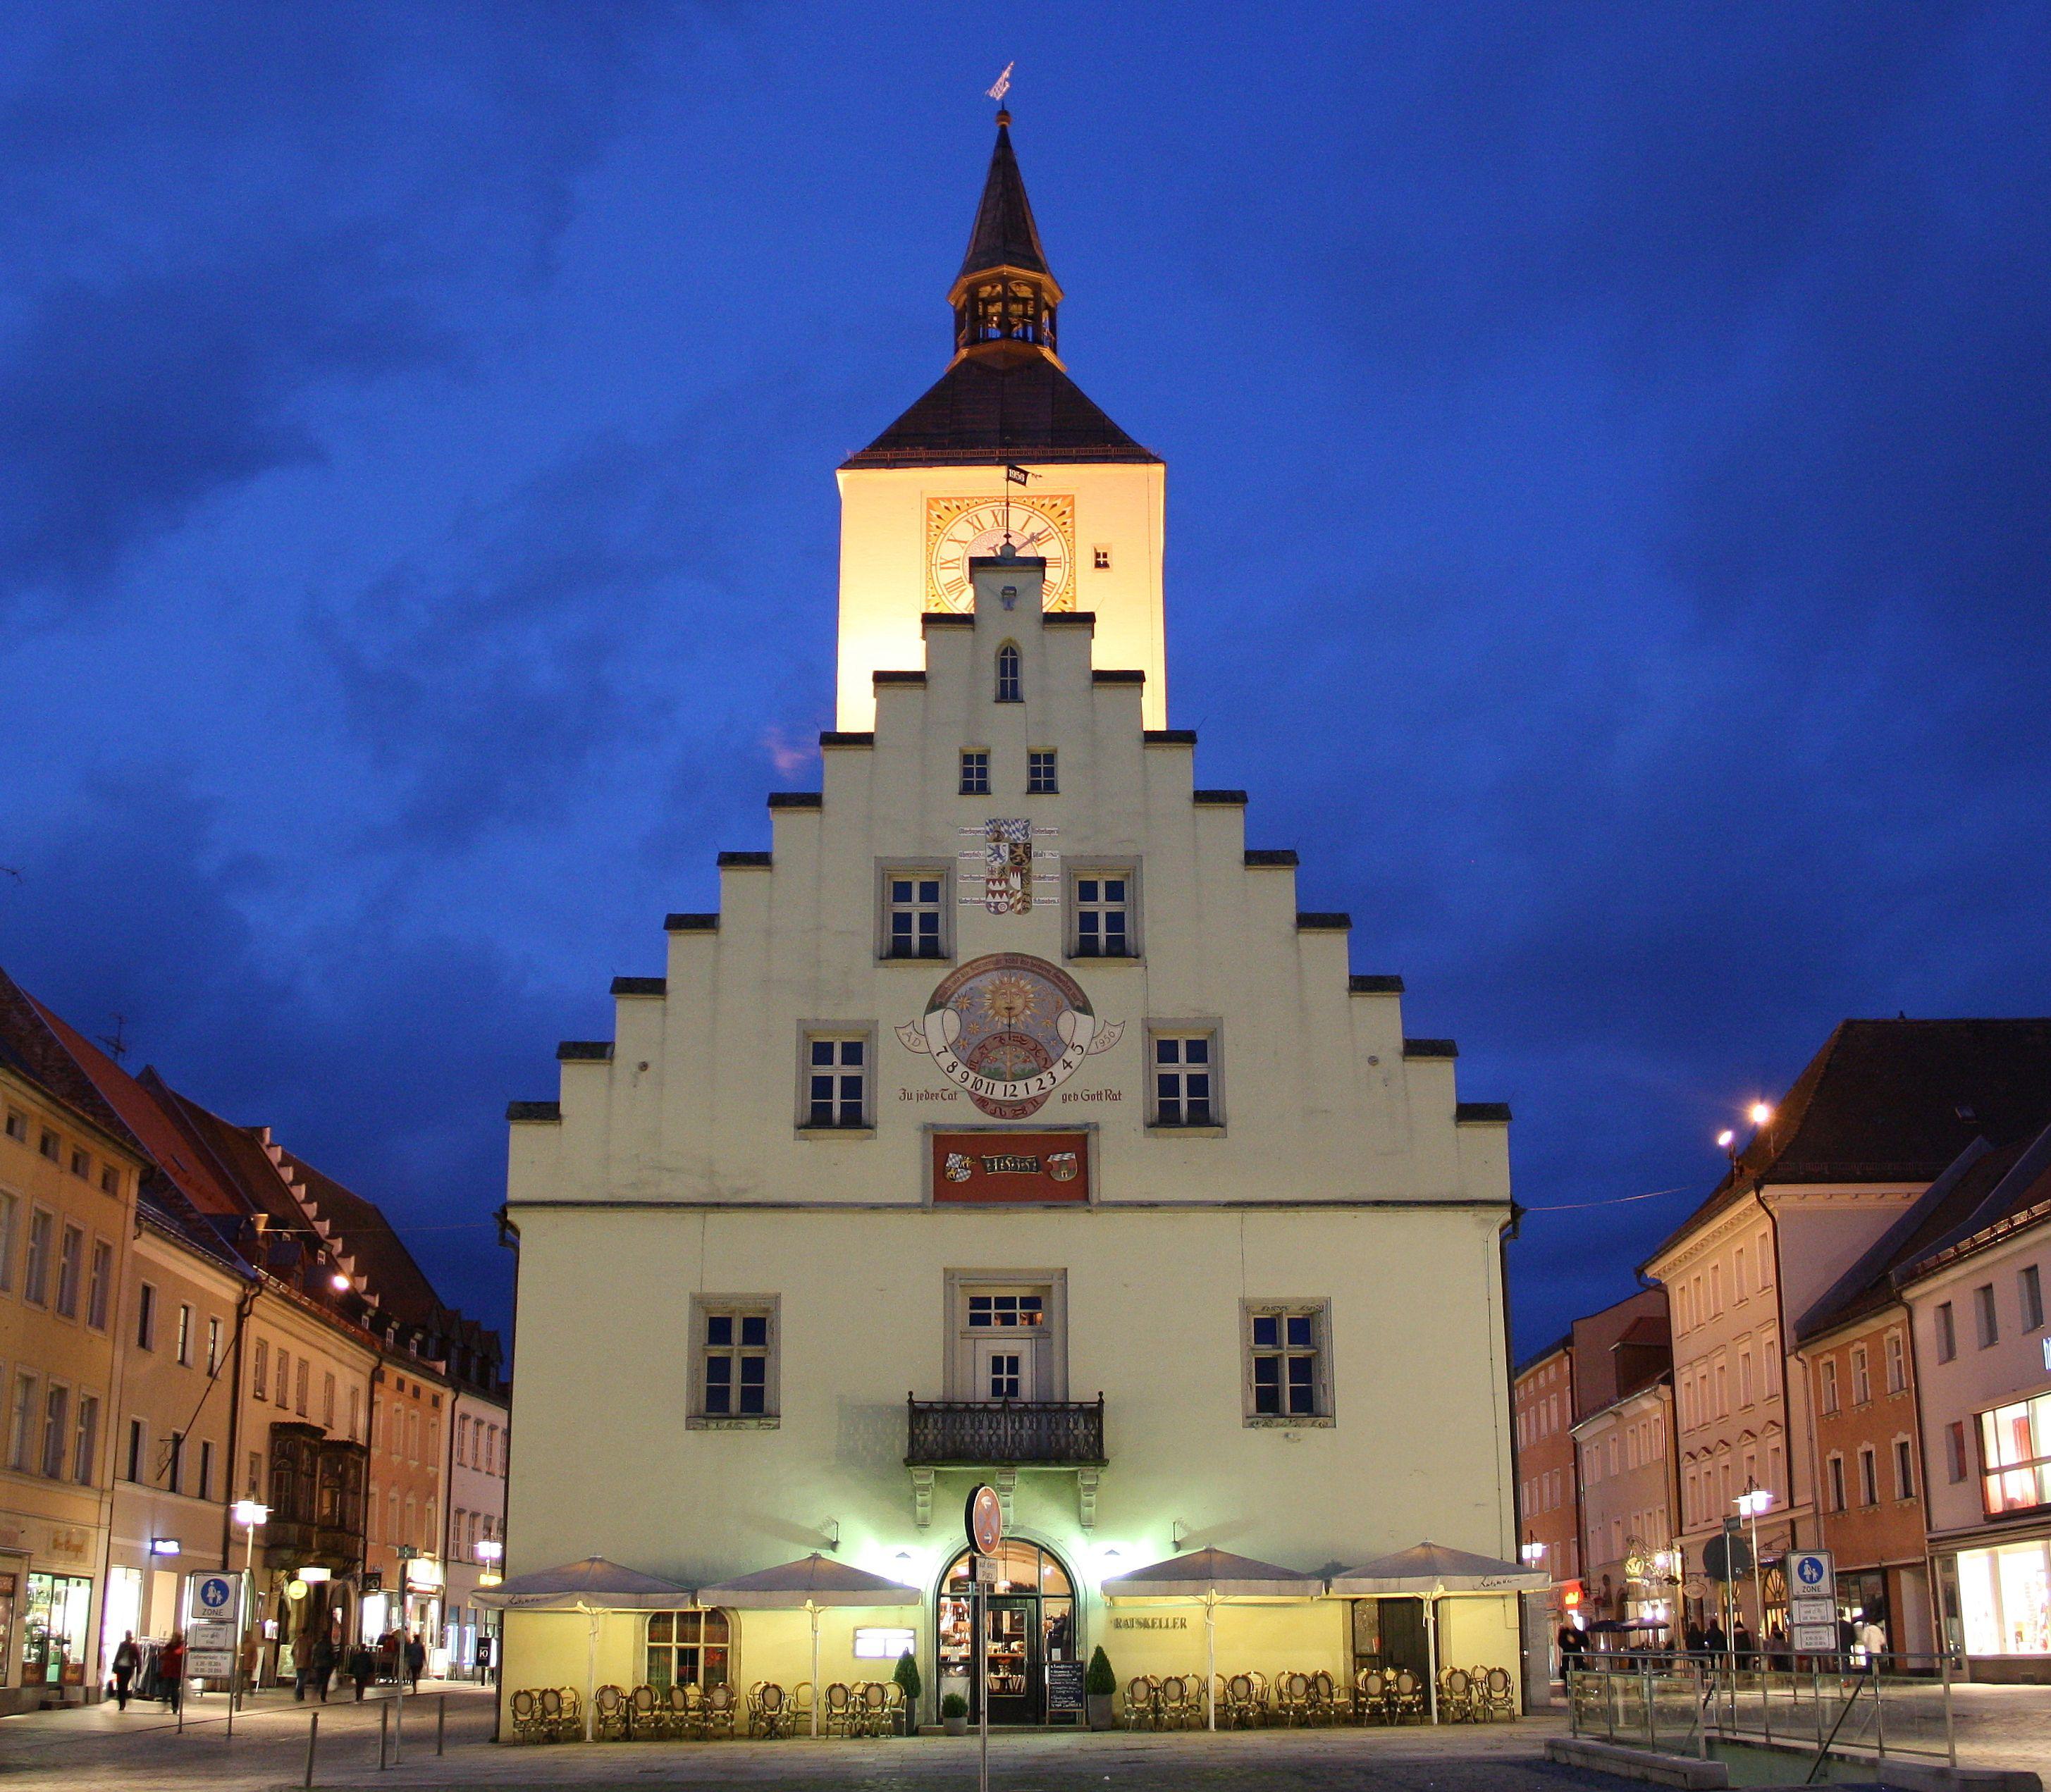 Das Altes Rathaus in Deggendorf (Germany)   Ferry